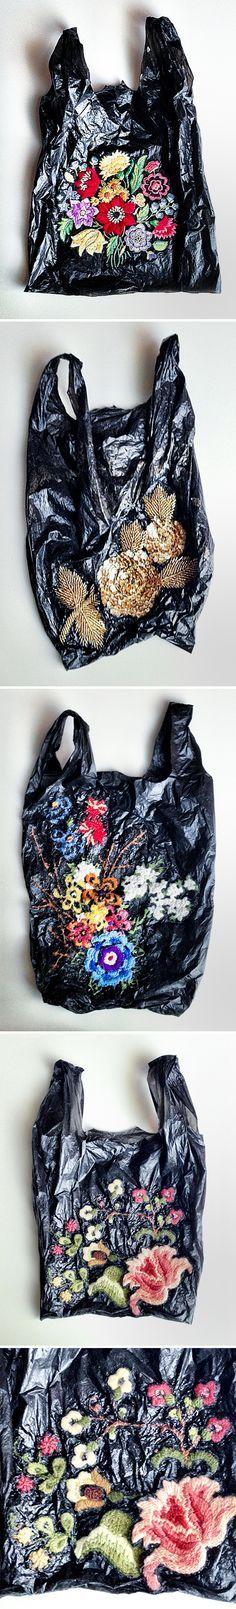 embroidery on plastic bags <3 nicoletta dela brown